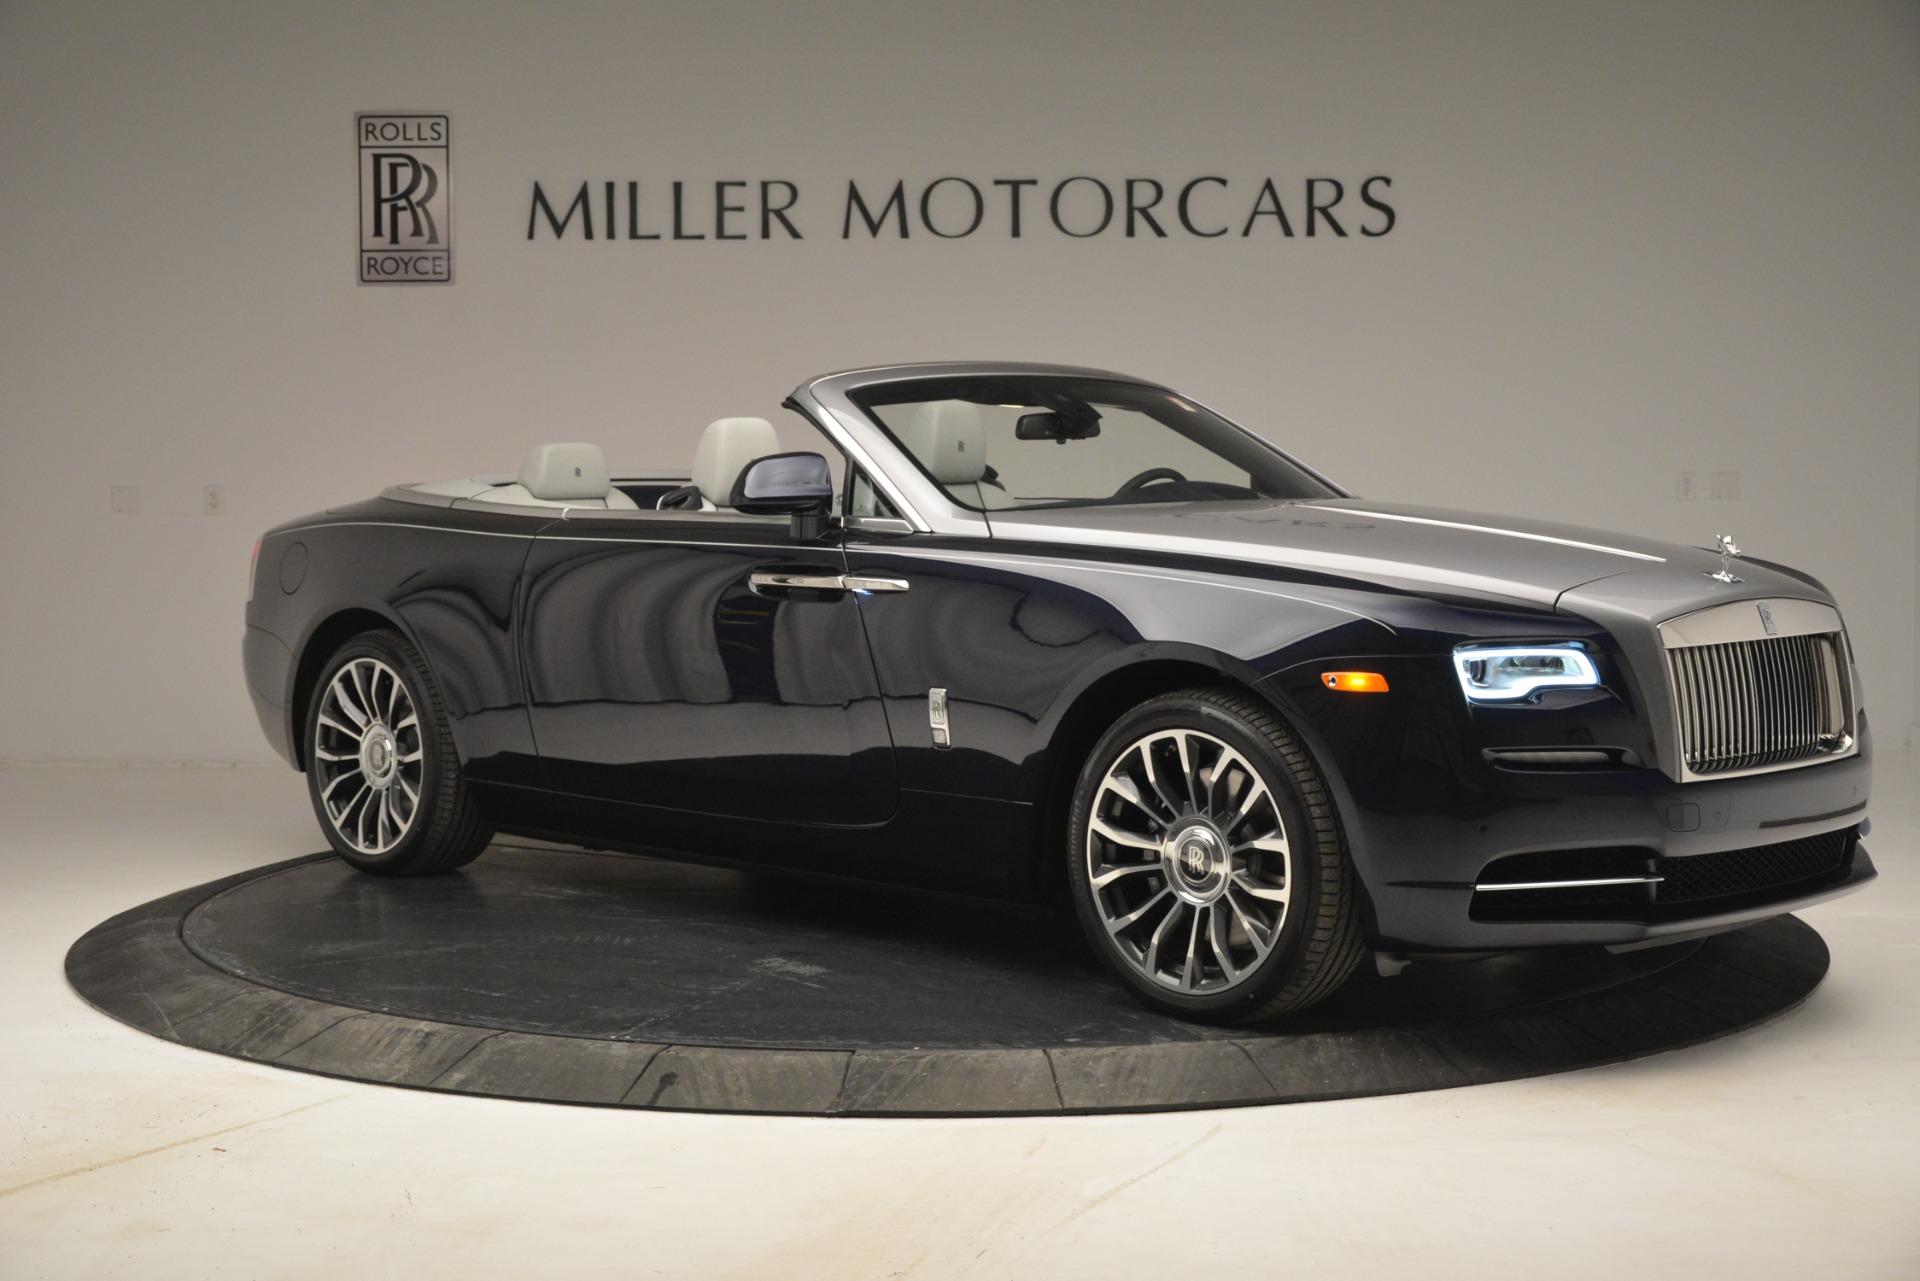 New 2019 Rolls-Royce Dawn  For Sale In Greenwich, CT 2974_p4